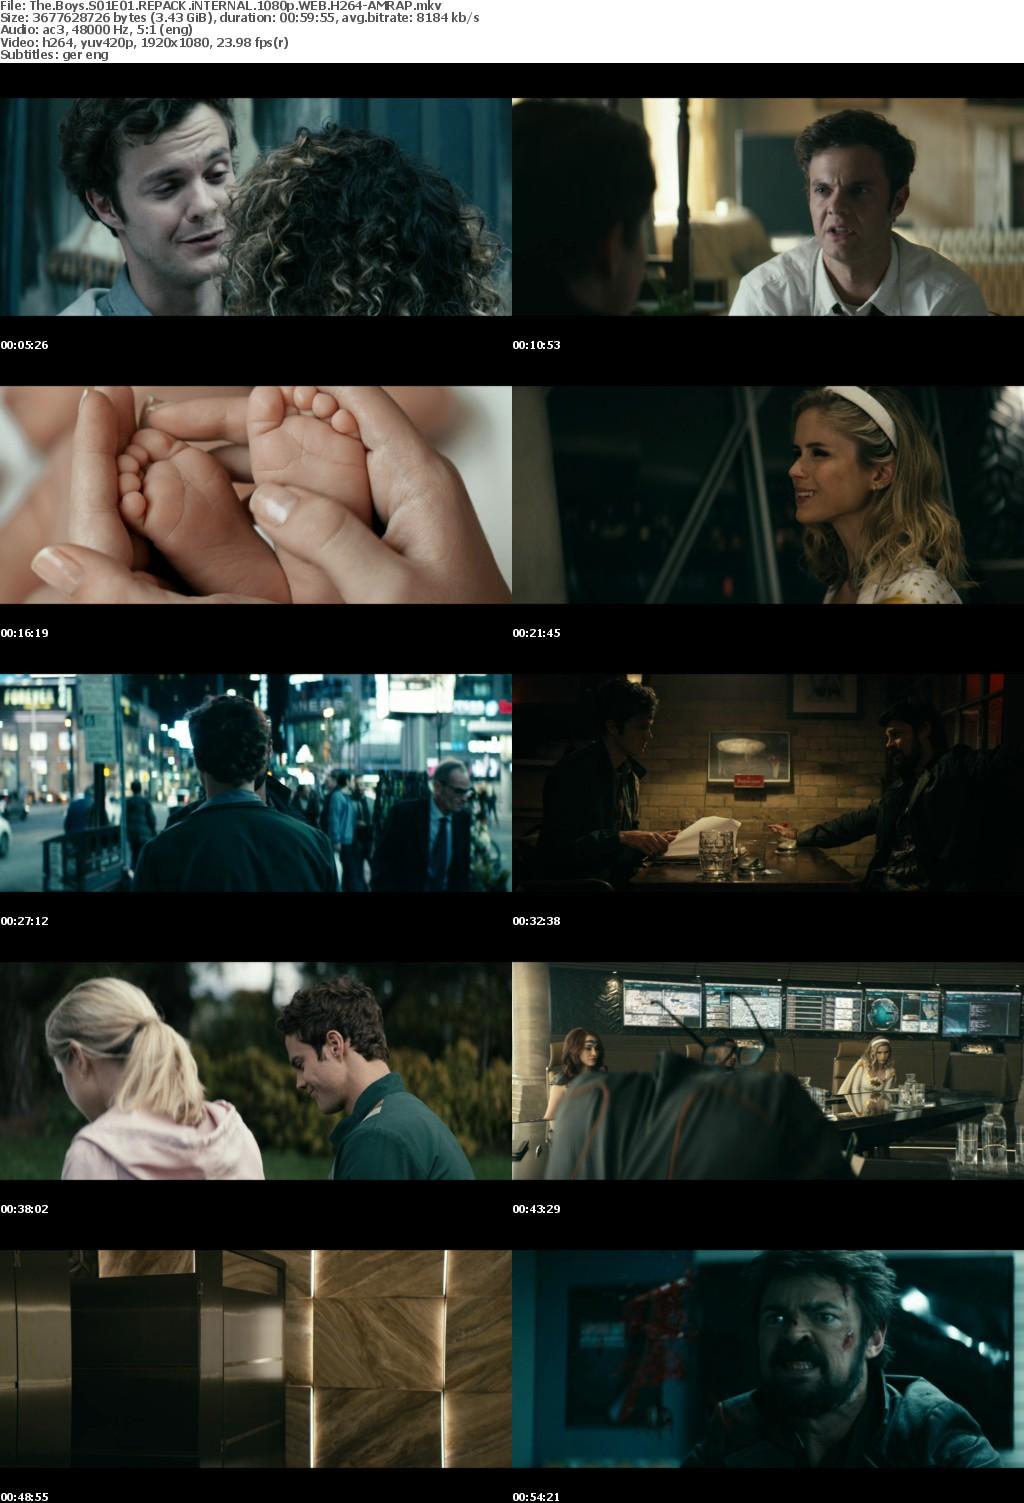 The Boys S01 1080p WEB H264-AMRAP